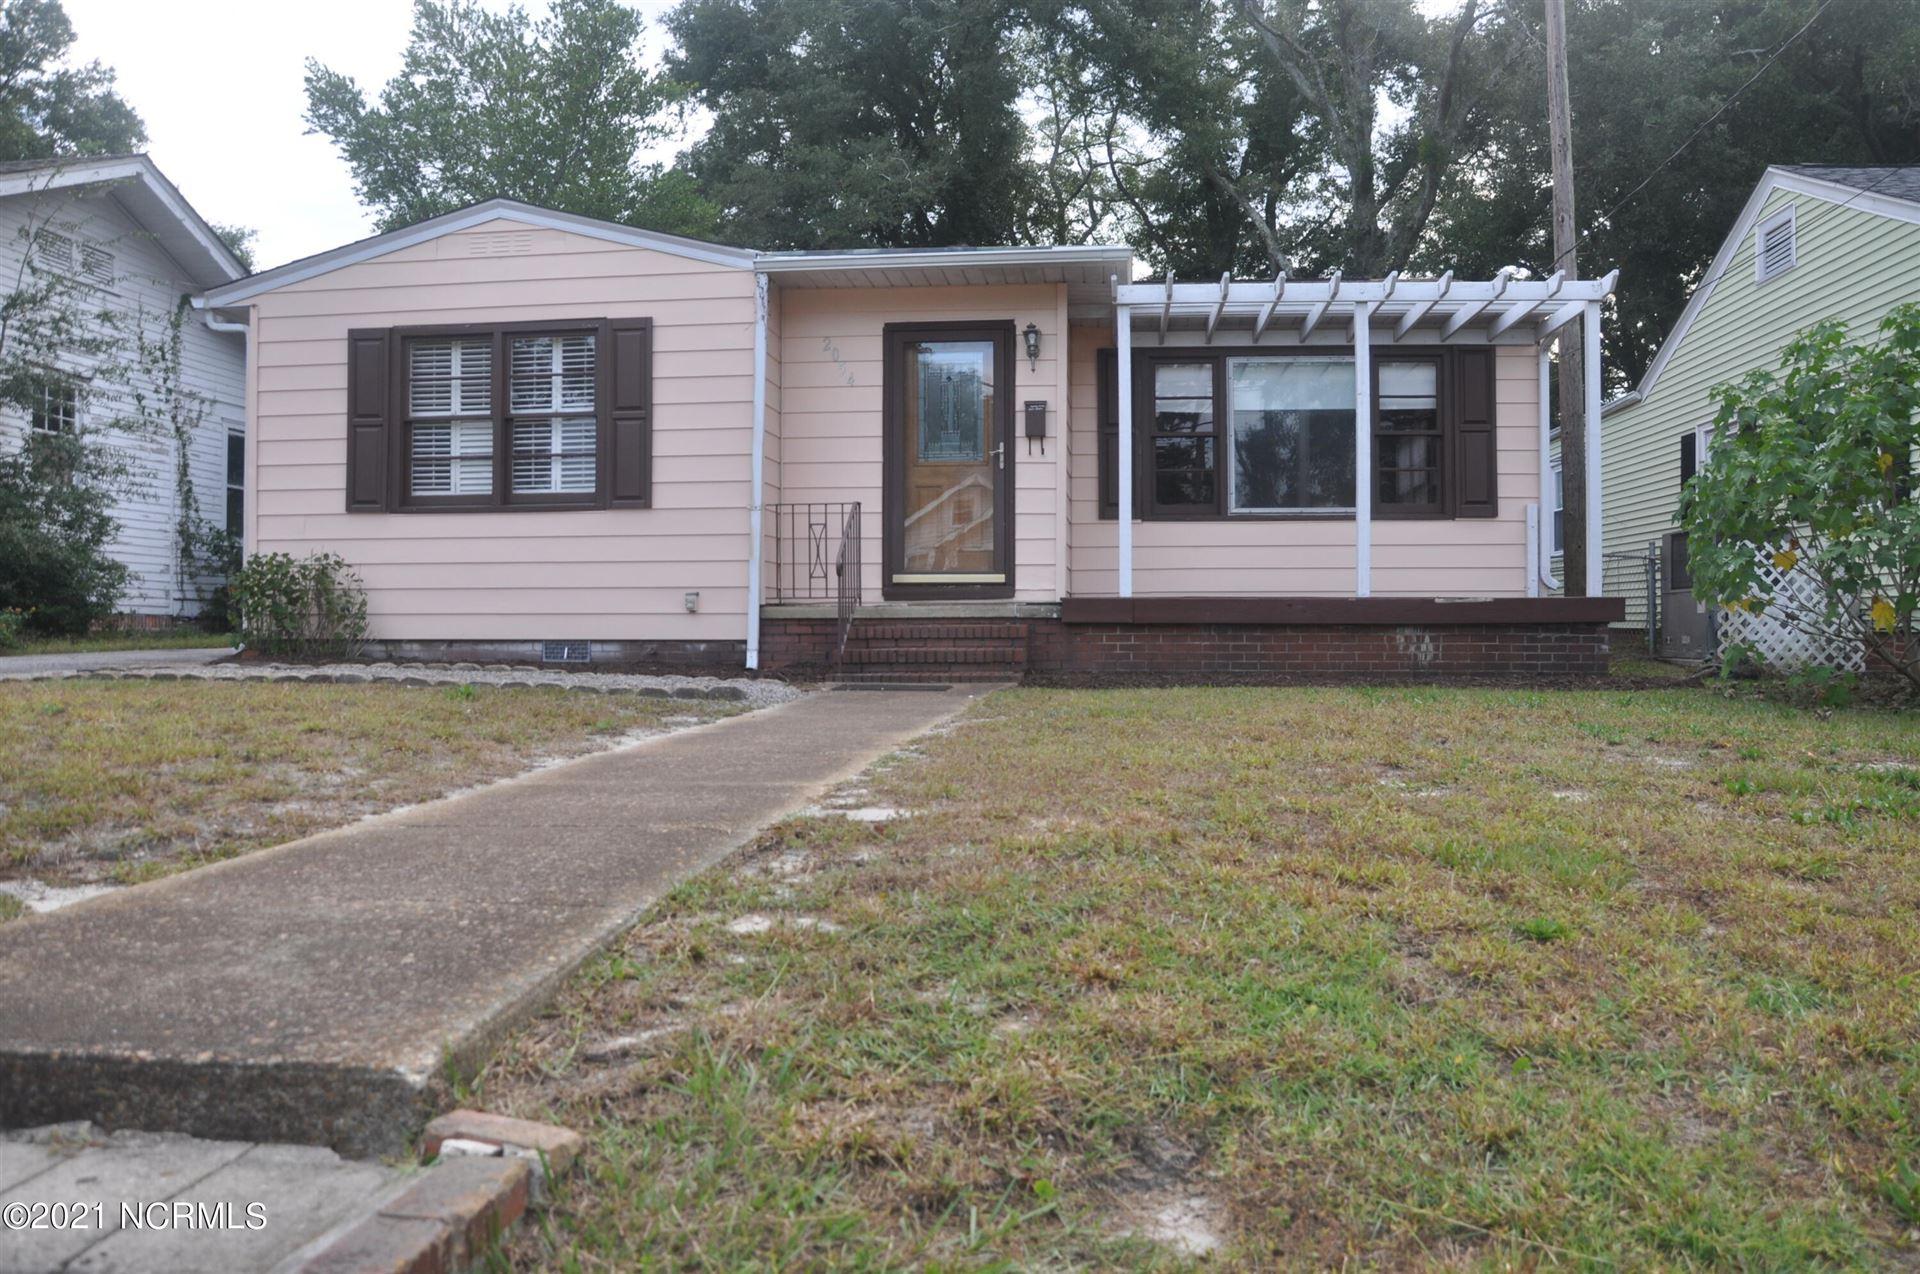 Photo of 2054 Washington Street, Wilmington, NC 28401 (MLS # 100294028)